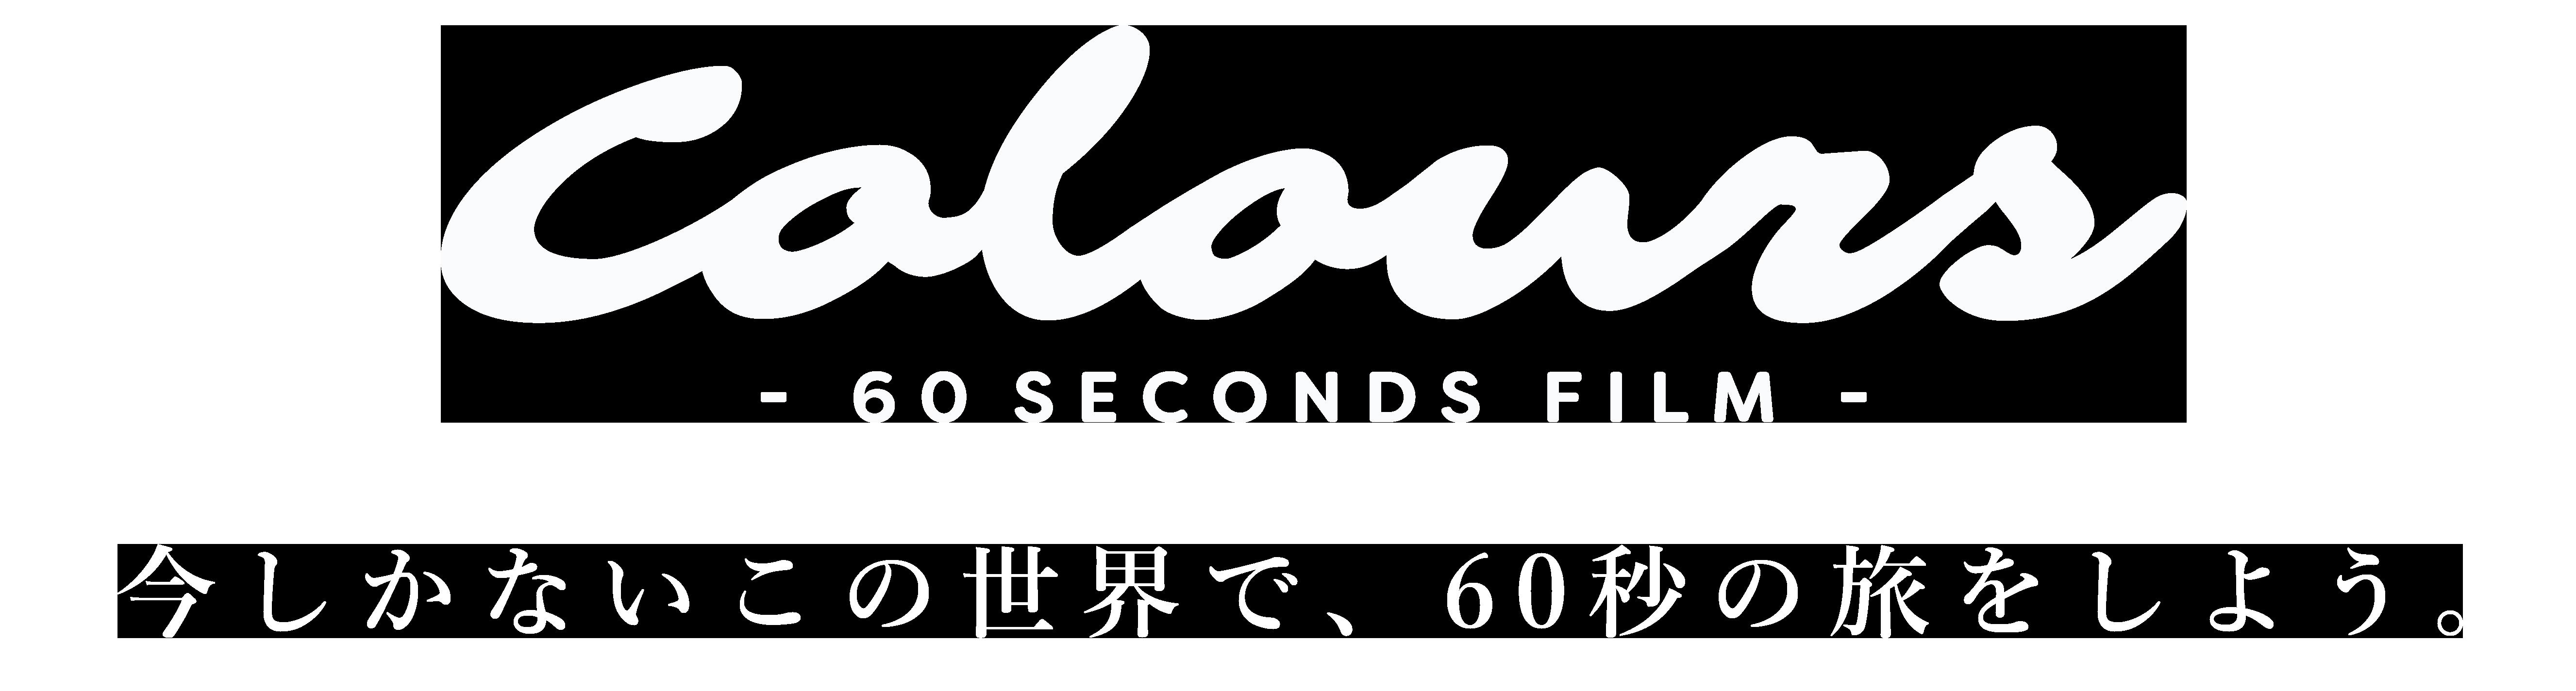 Colours-60secondsfilm- 今しかないこの世界で、60秒の旅をしよう。